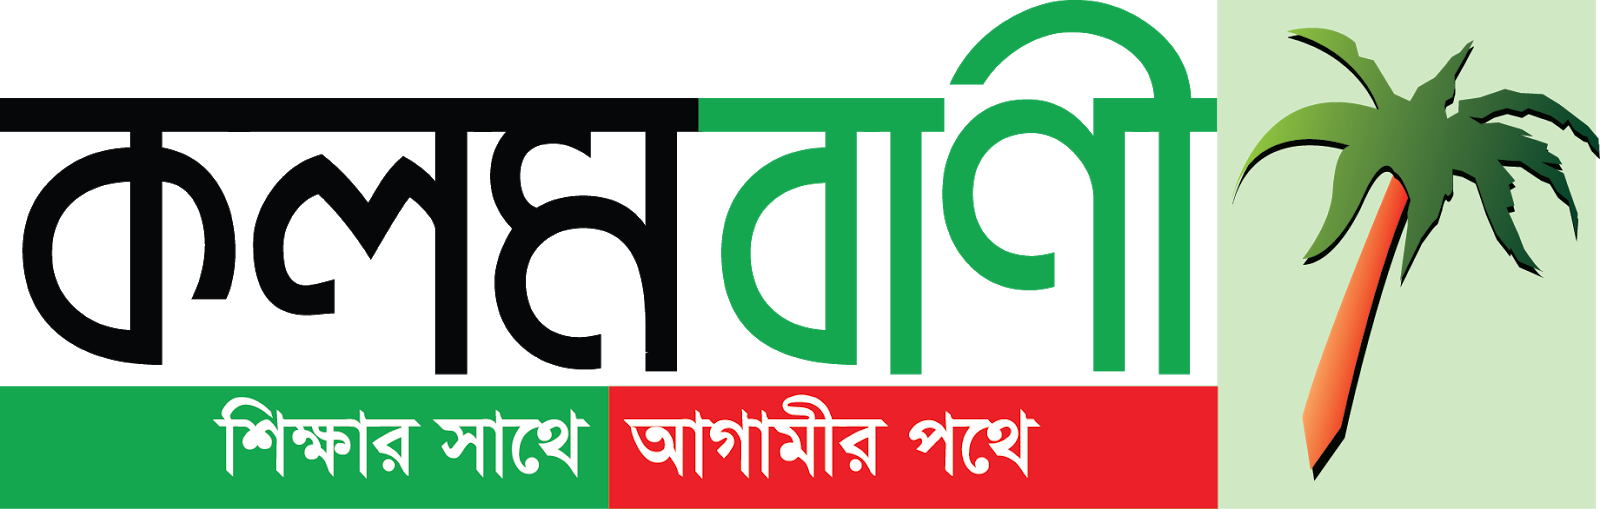 KalomBani । Online News, Literature, Education, Publications, Cultural & Research Web Portal